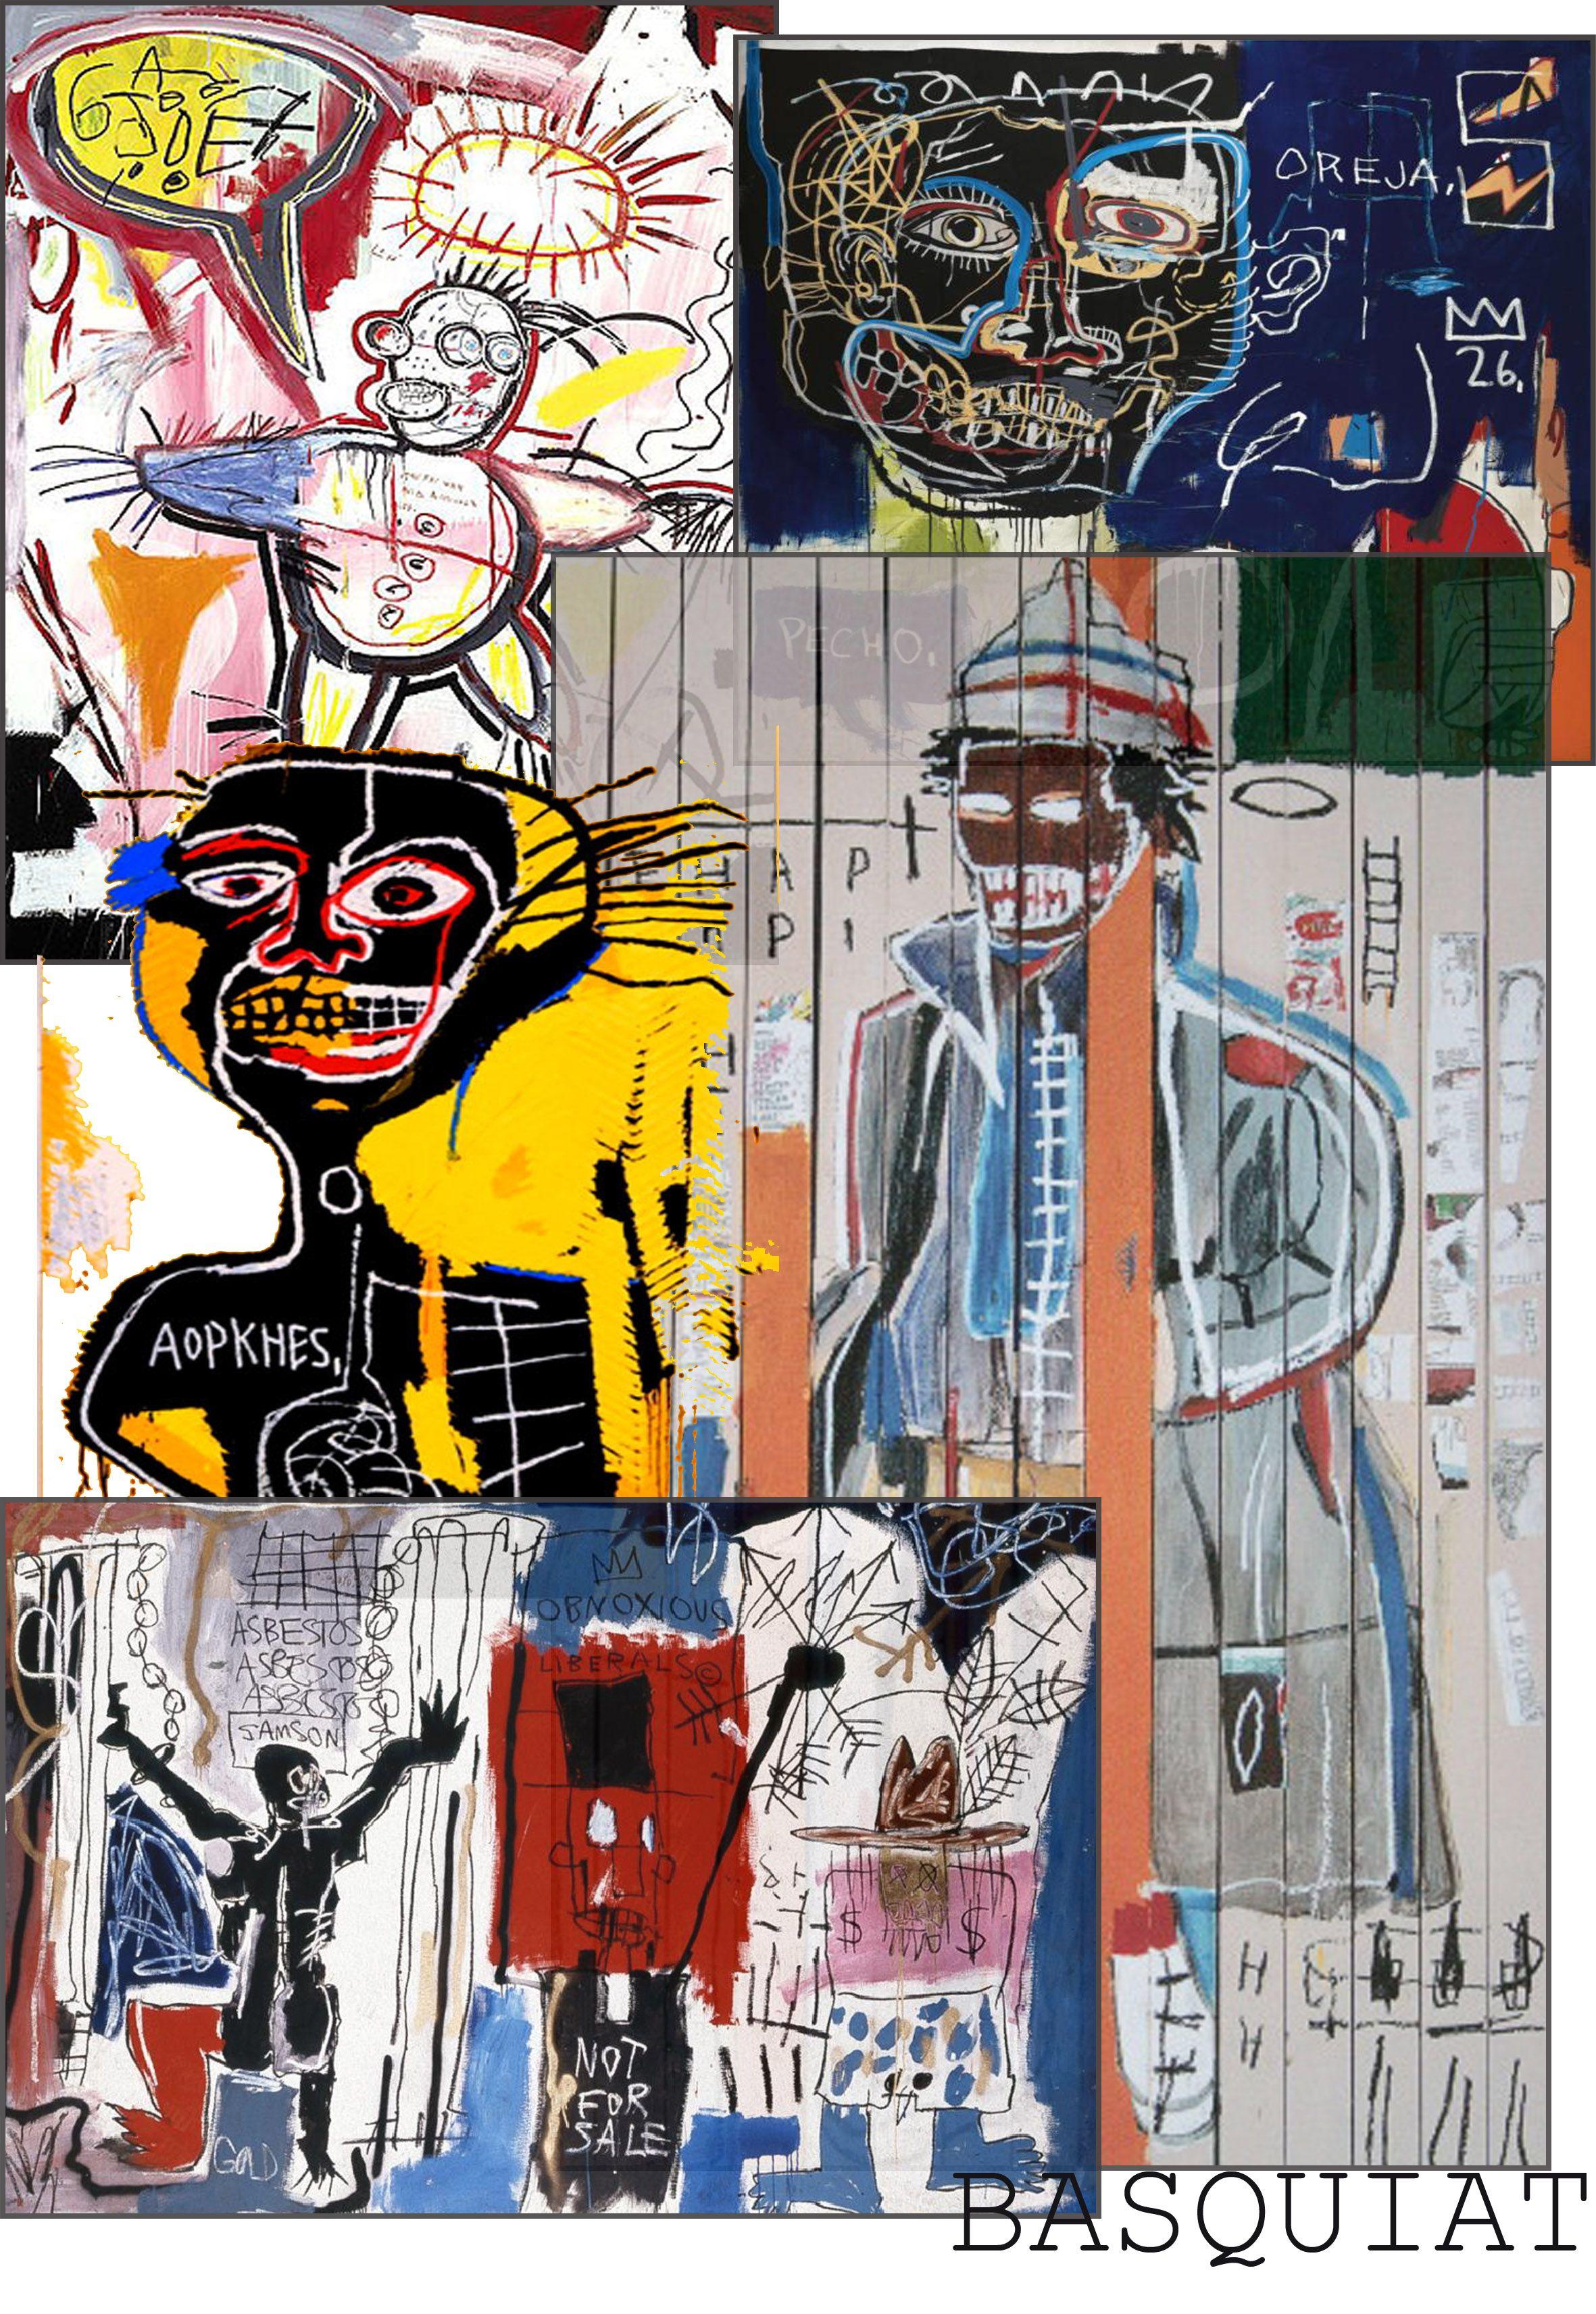 basquiat drawings lines traits ink jean michel. Black Bedroom Furniture Sets. Home Design Ideas